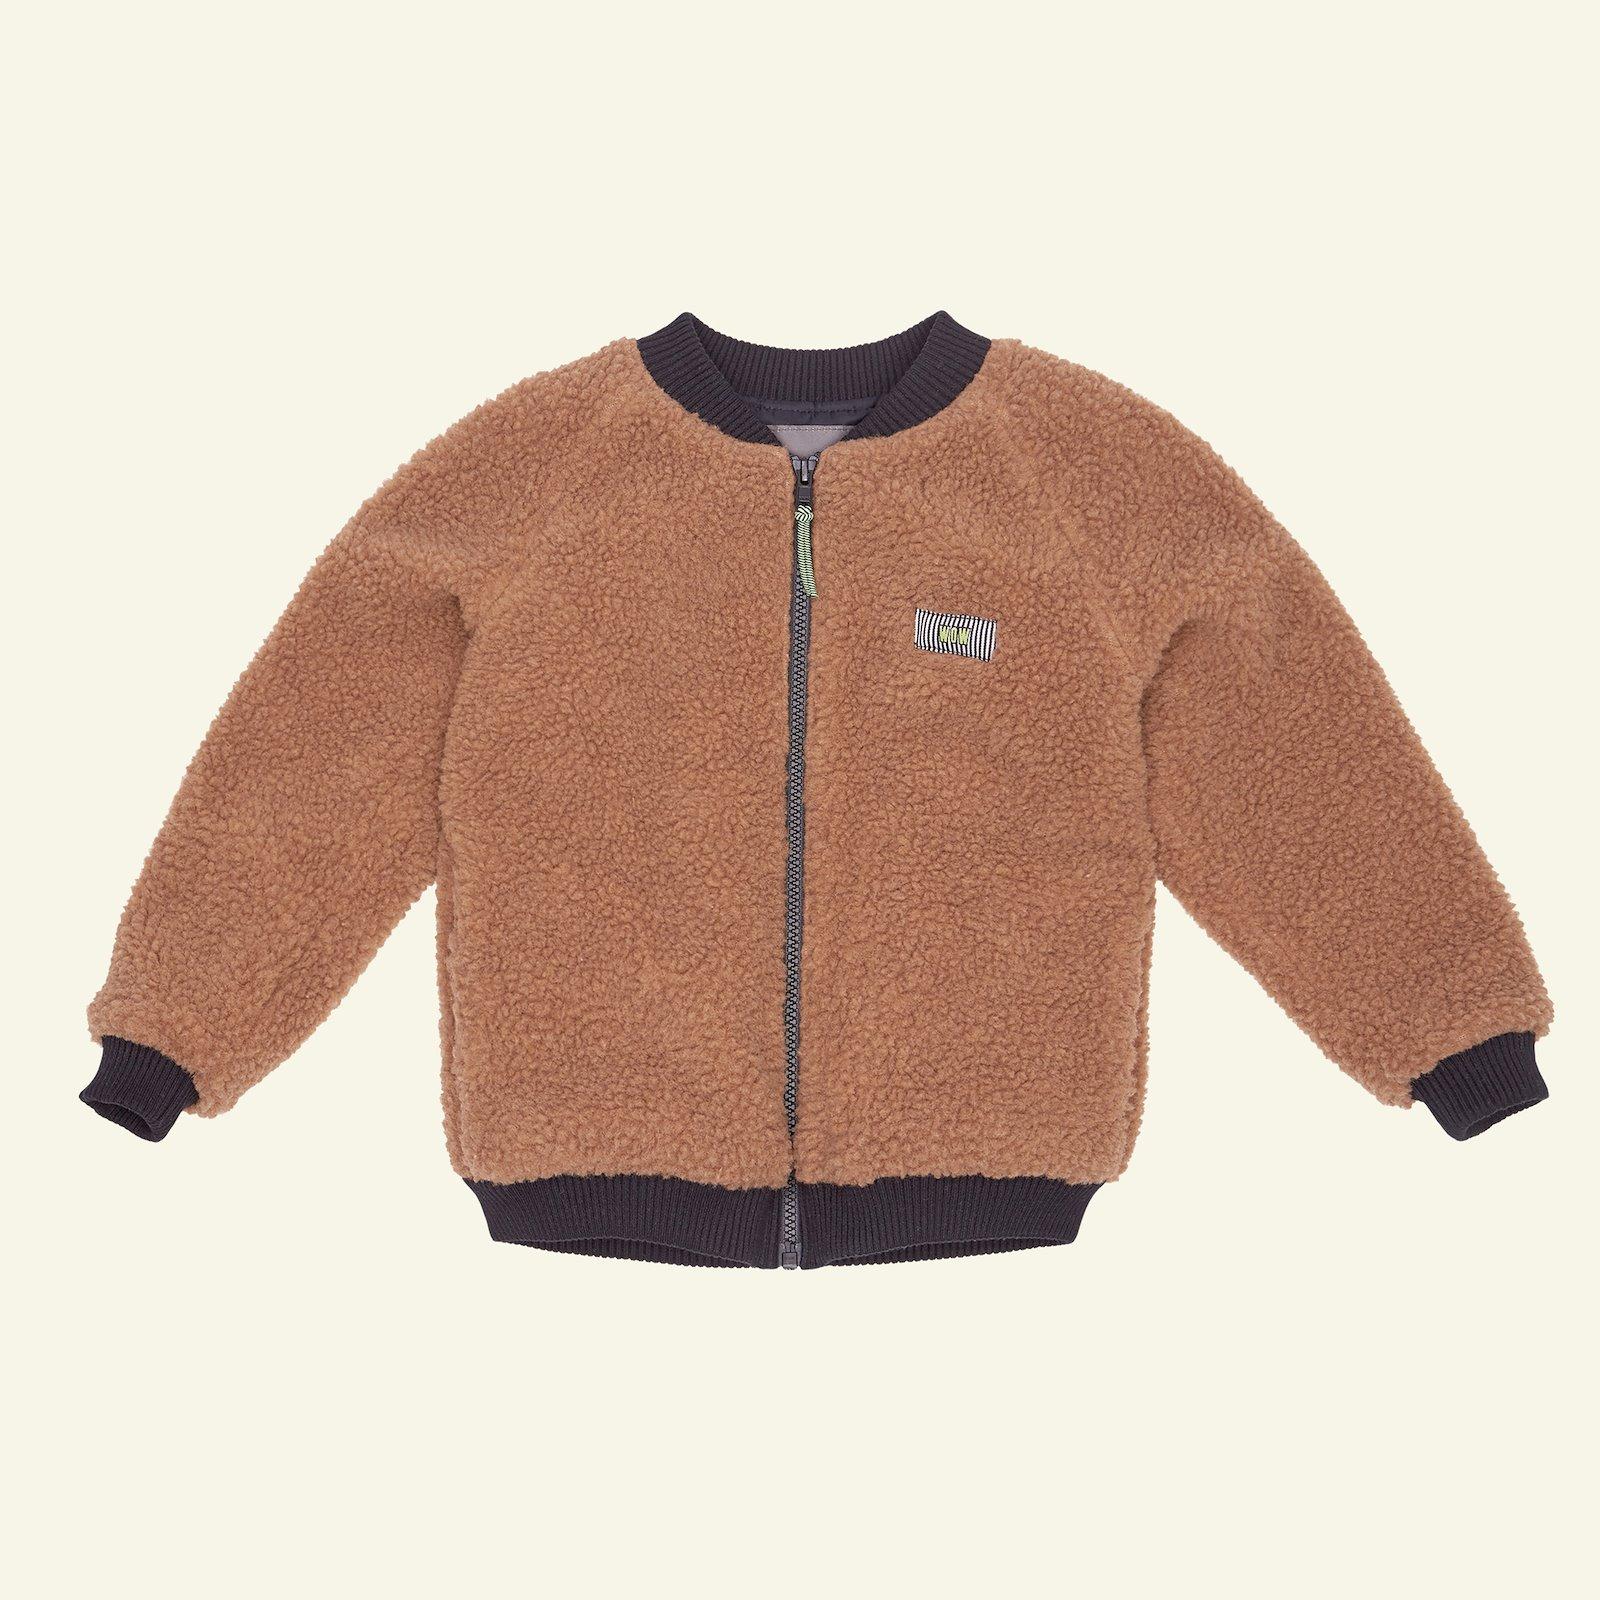 Bomber jacket, 122/7y p64017_910274_96077_26437_sskit